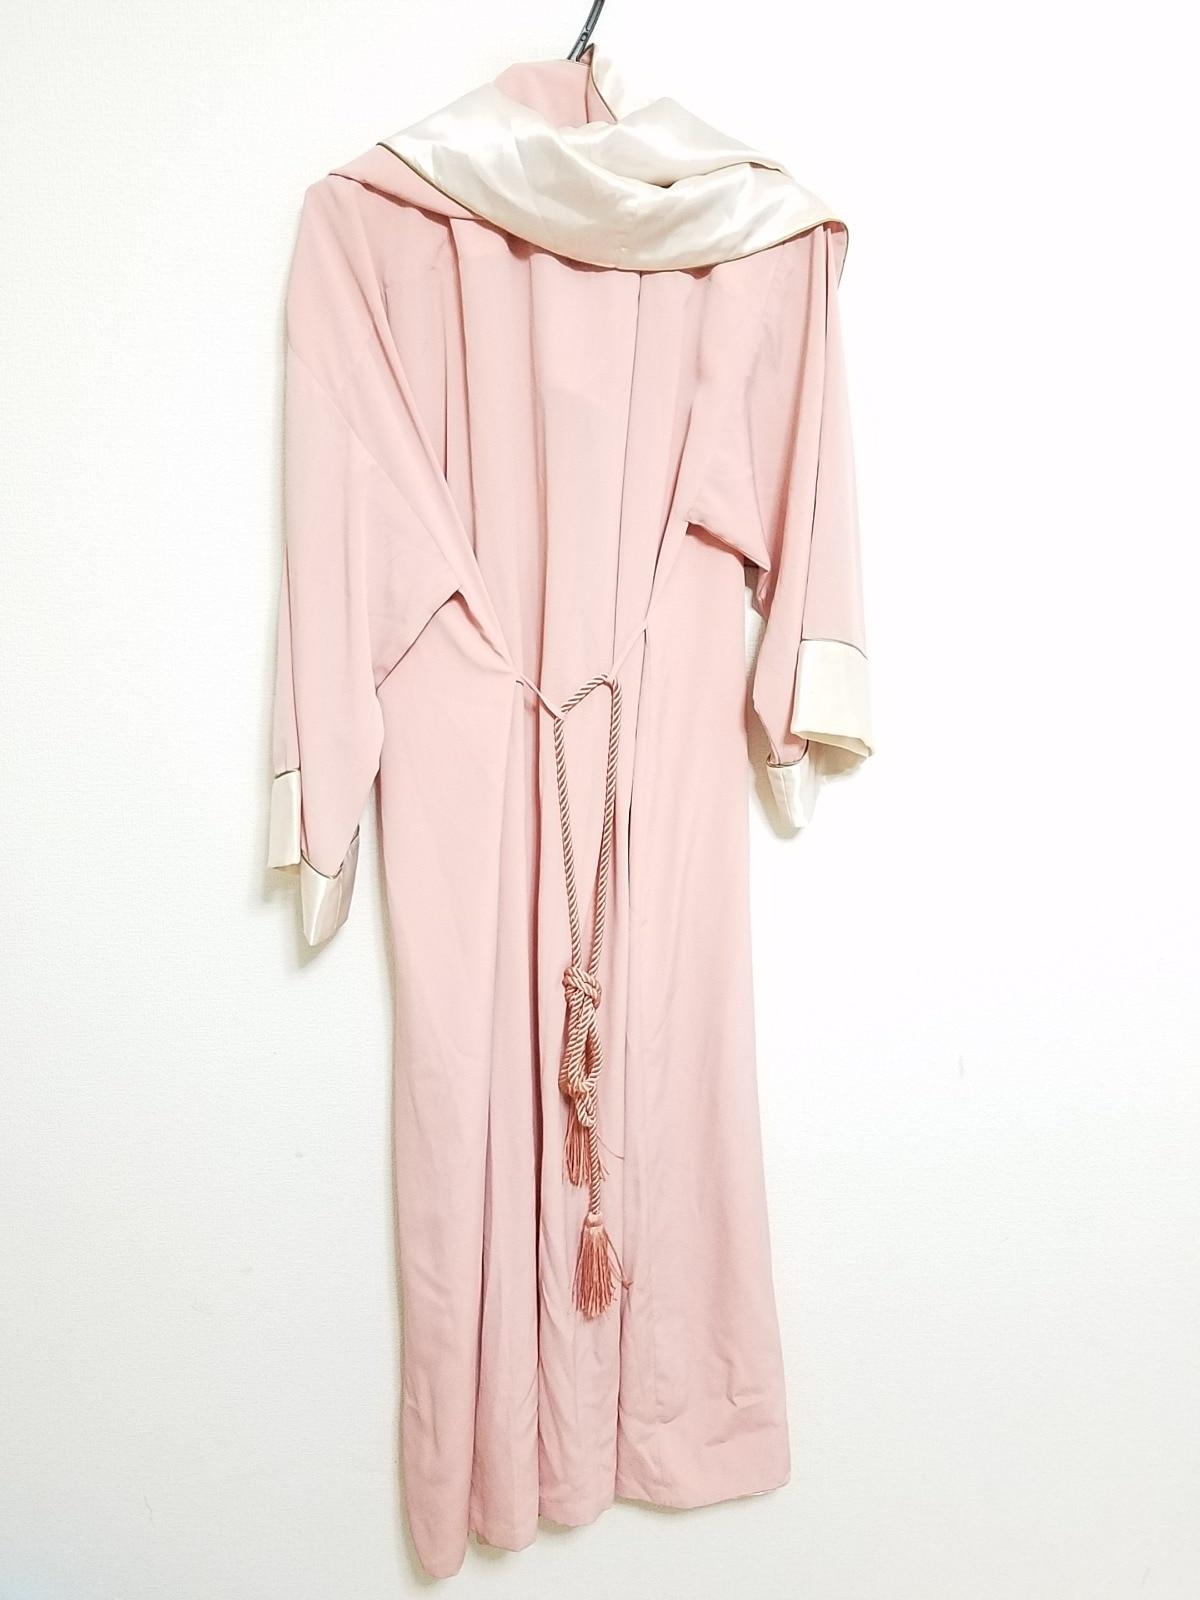 Victoria's Secret(ヴィクトリアシークレット)のコート